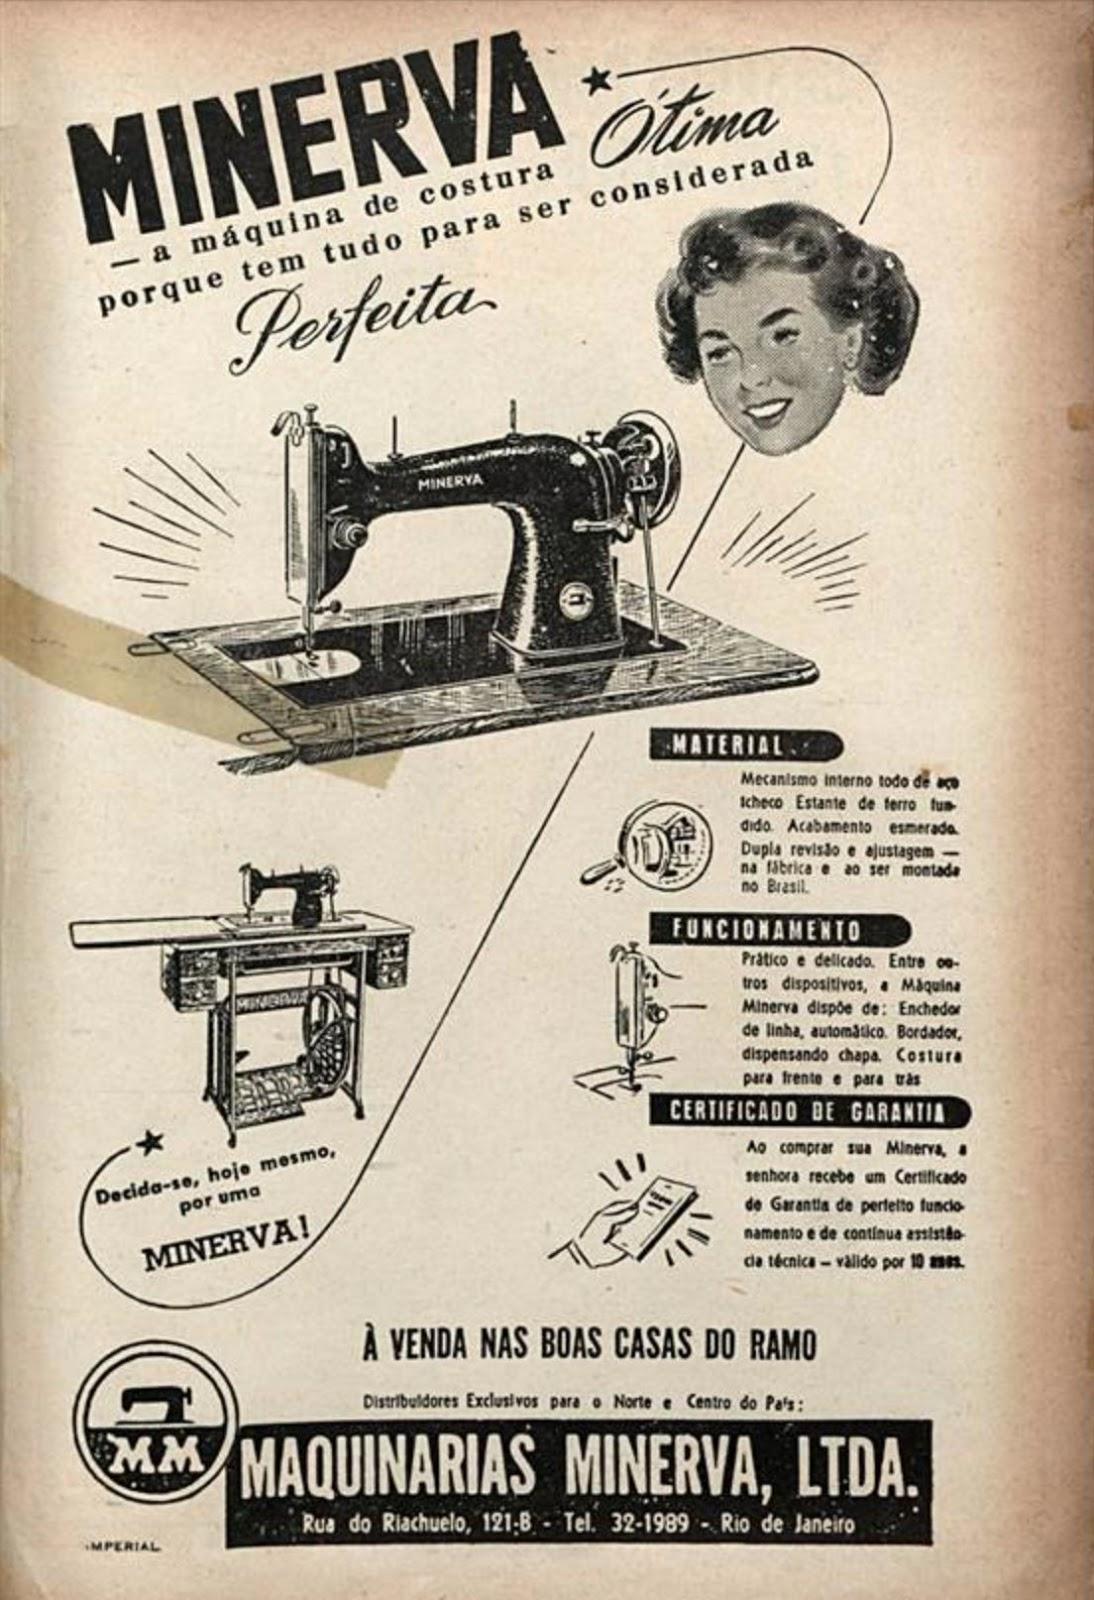 Propaganda antiga da Minerva apresentando sua máquina de costura em 1951